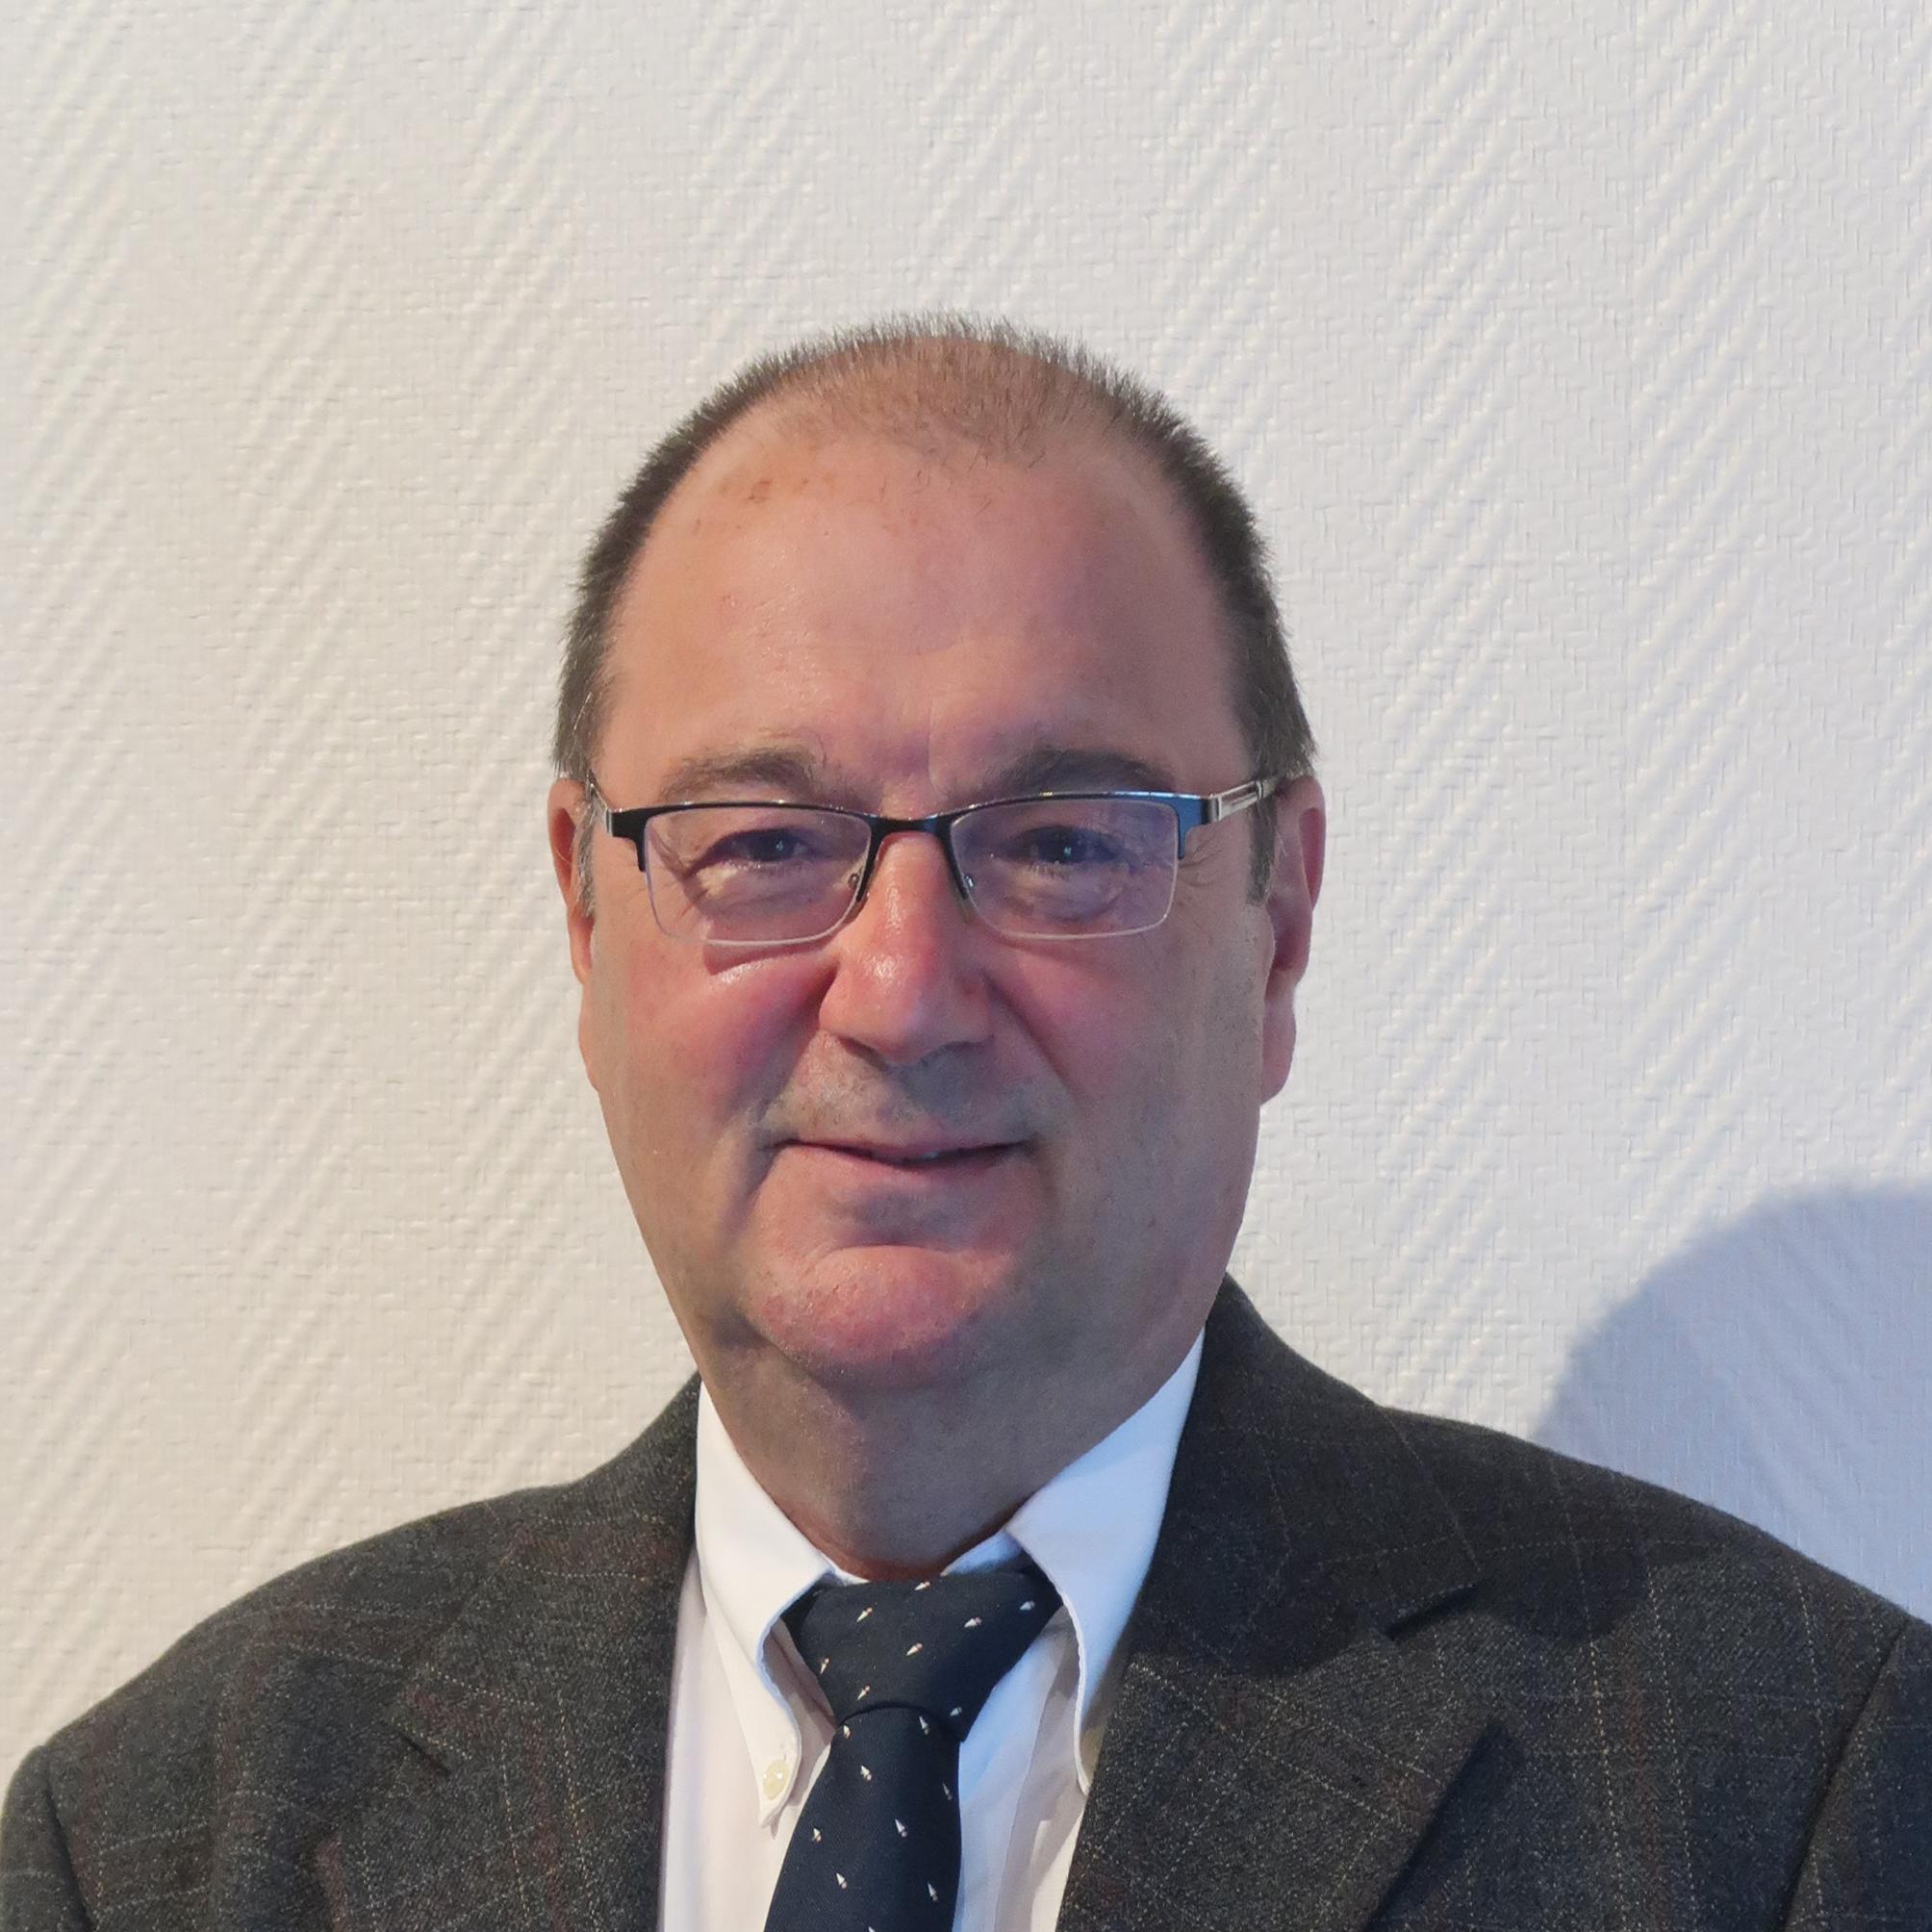 Alain Soubrillard